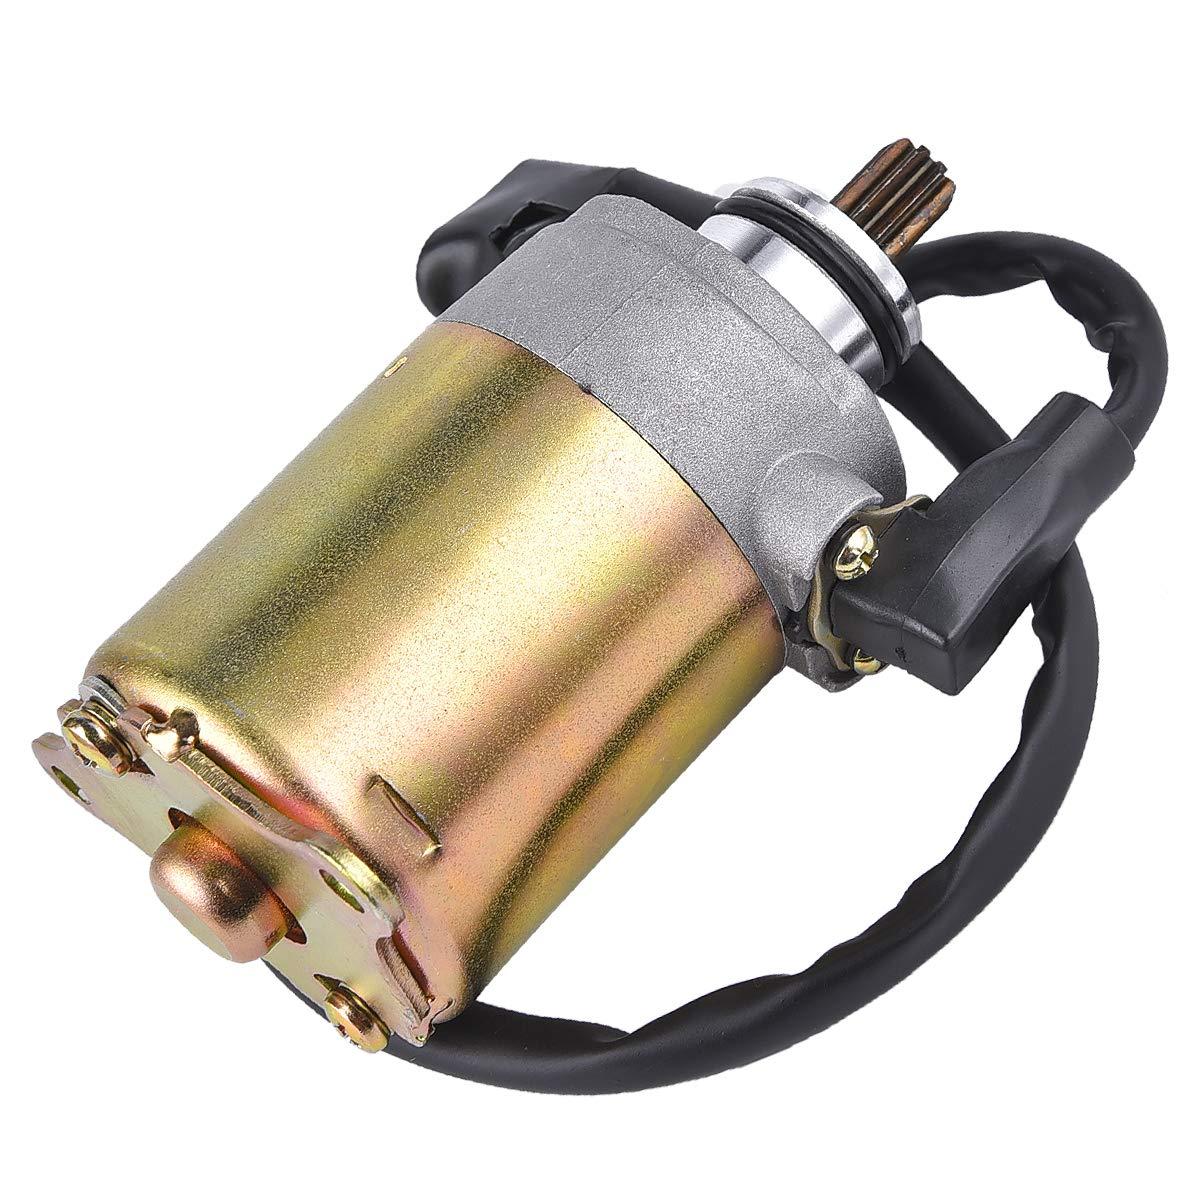 Starter Motor Kandi 150cc 200cc Go Kart ATV # E150-12-000923 MTATCN